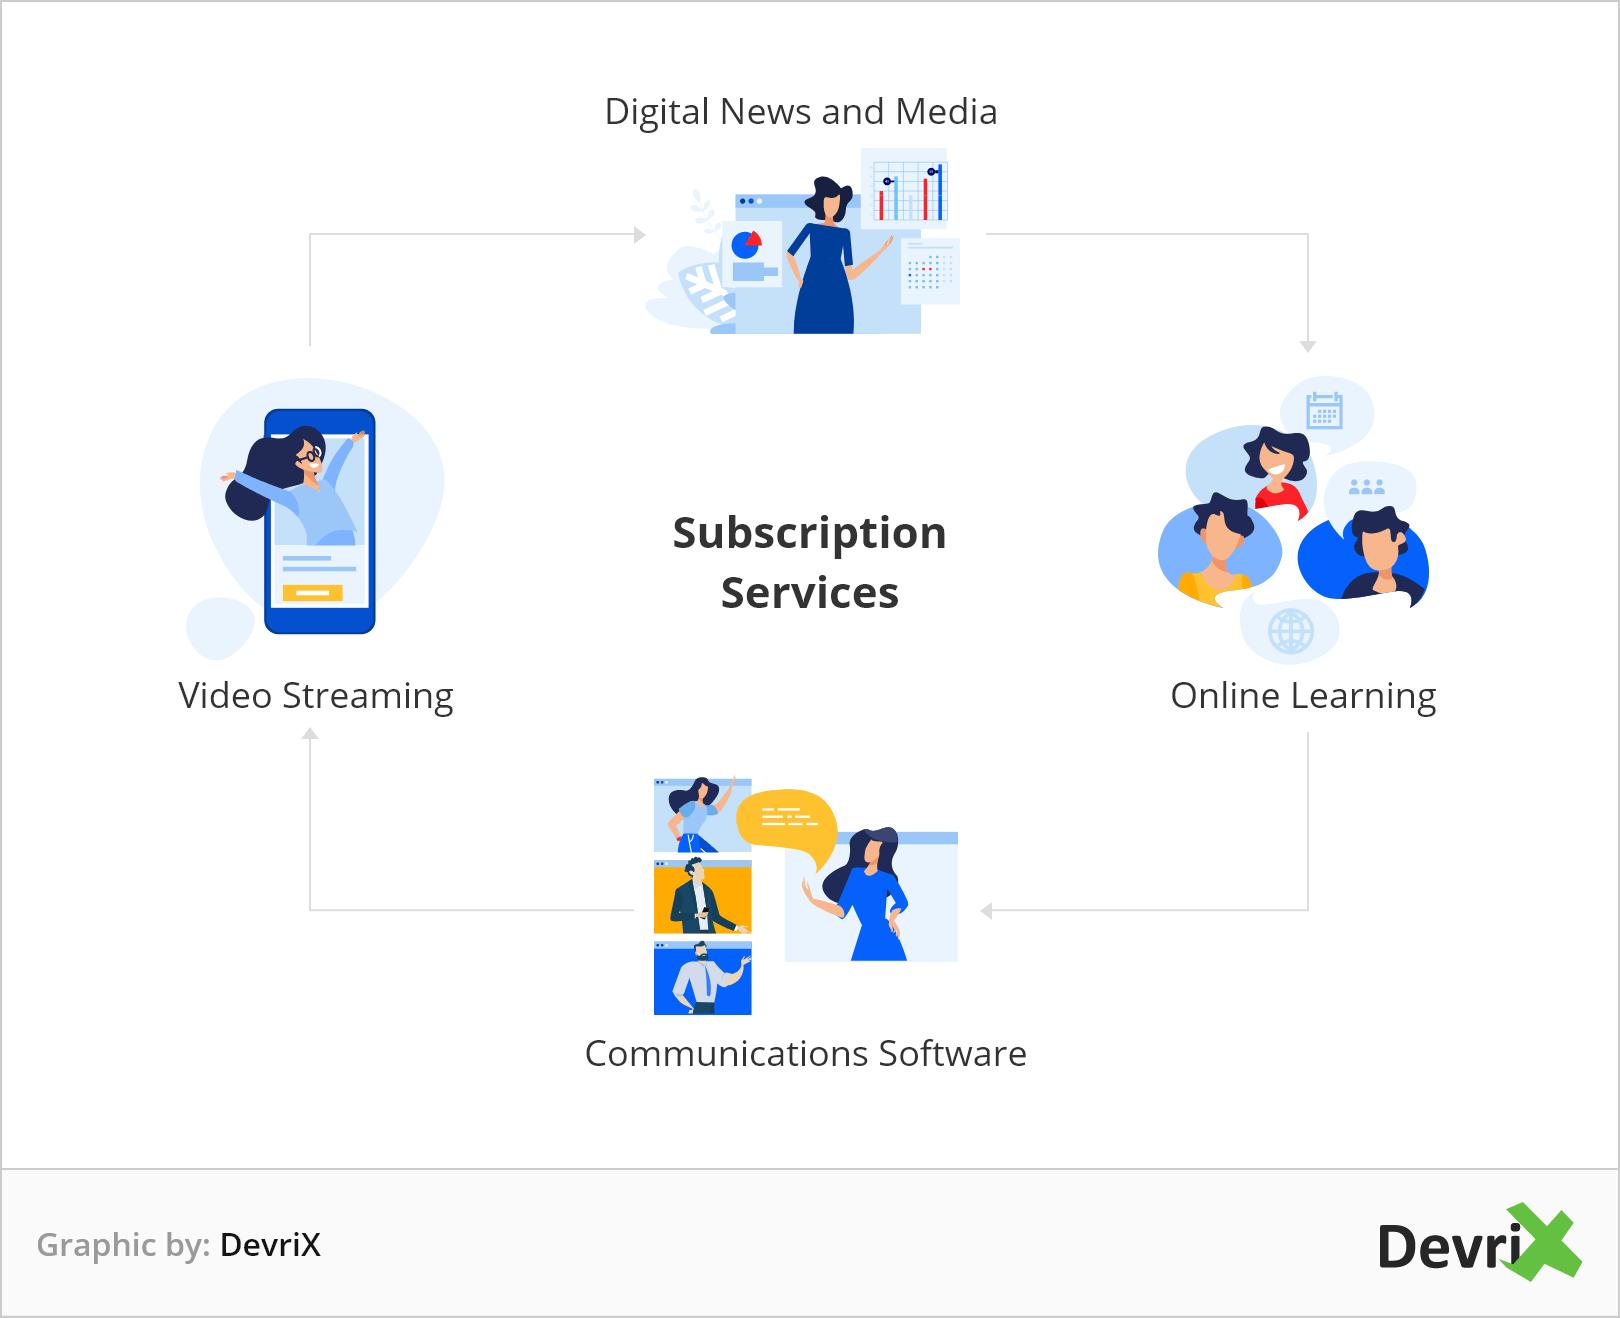 subscription services